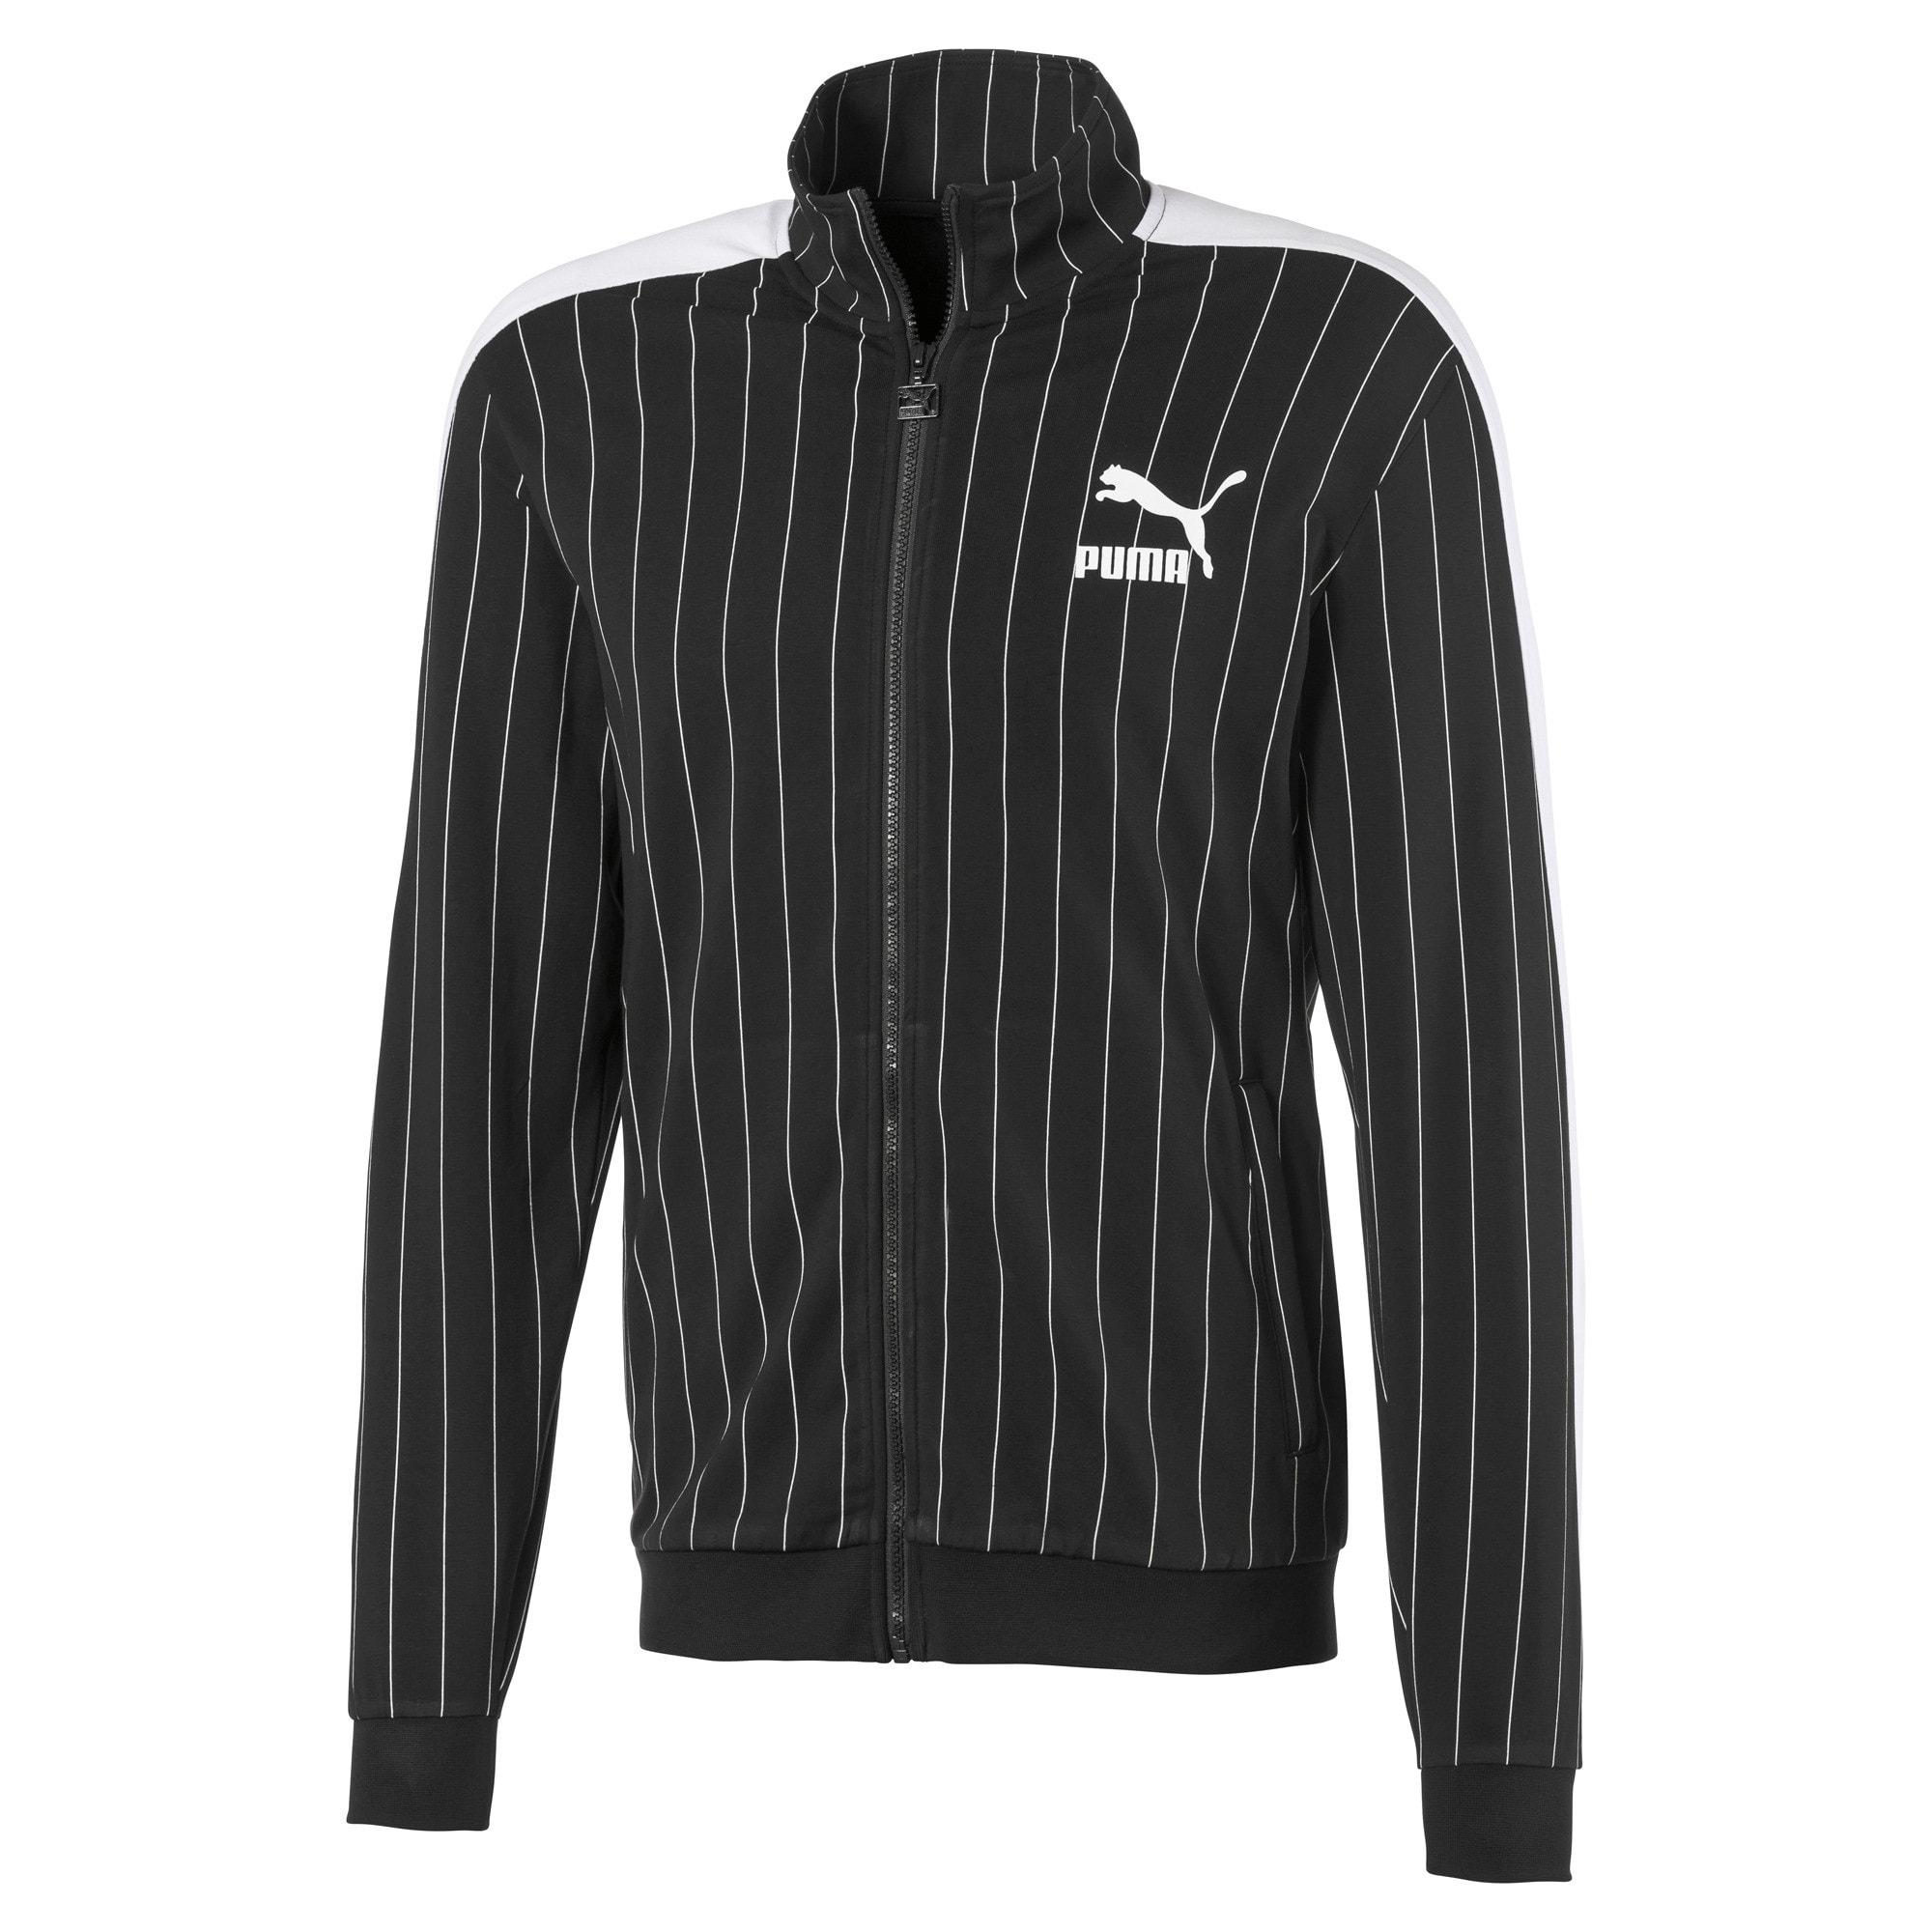 Thumbnail 1 of Archive Pinstripe T7 Men's Track Jacket, Cotton Black, medium